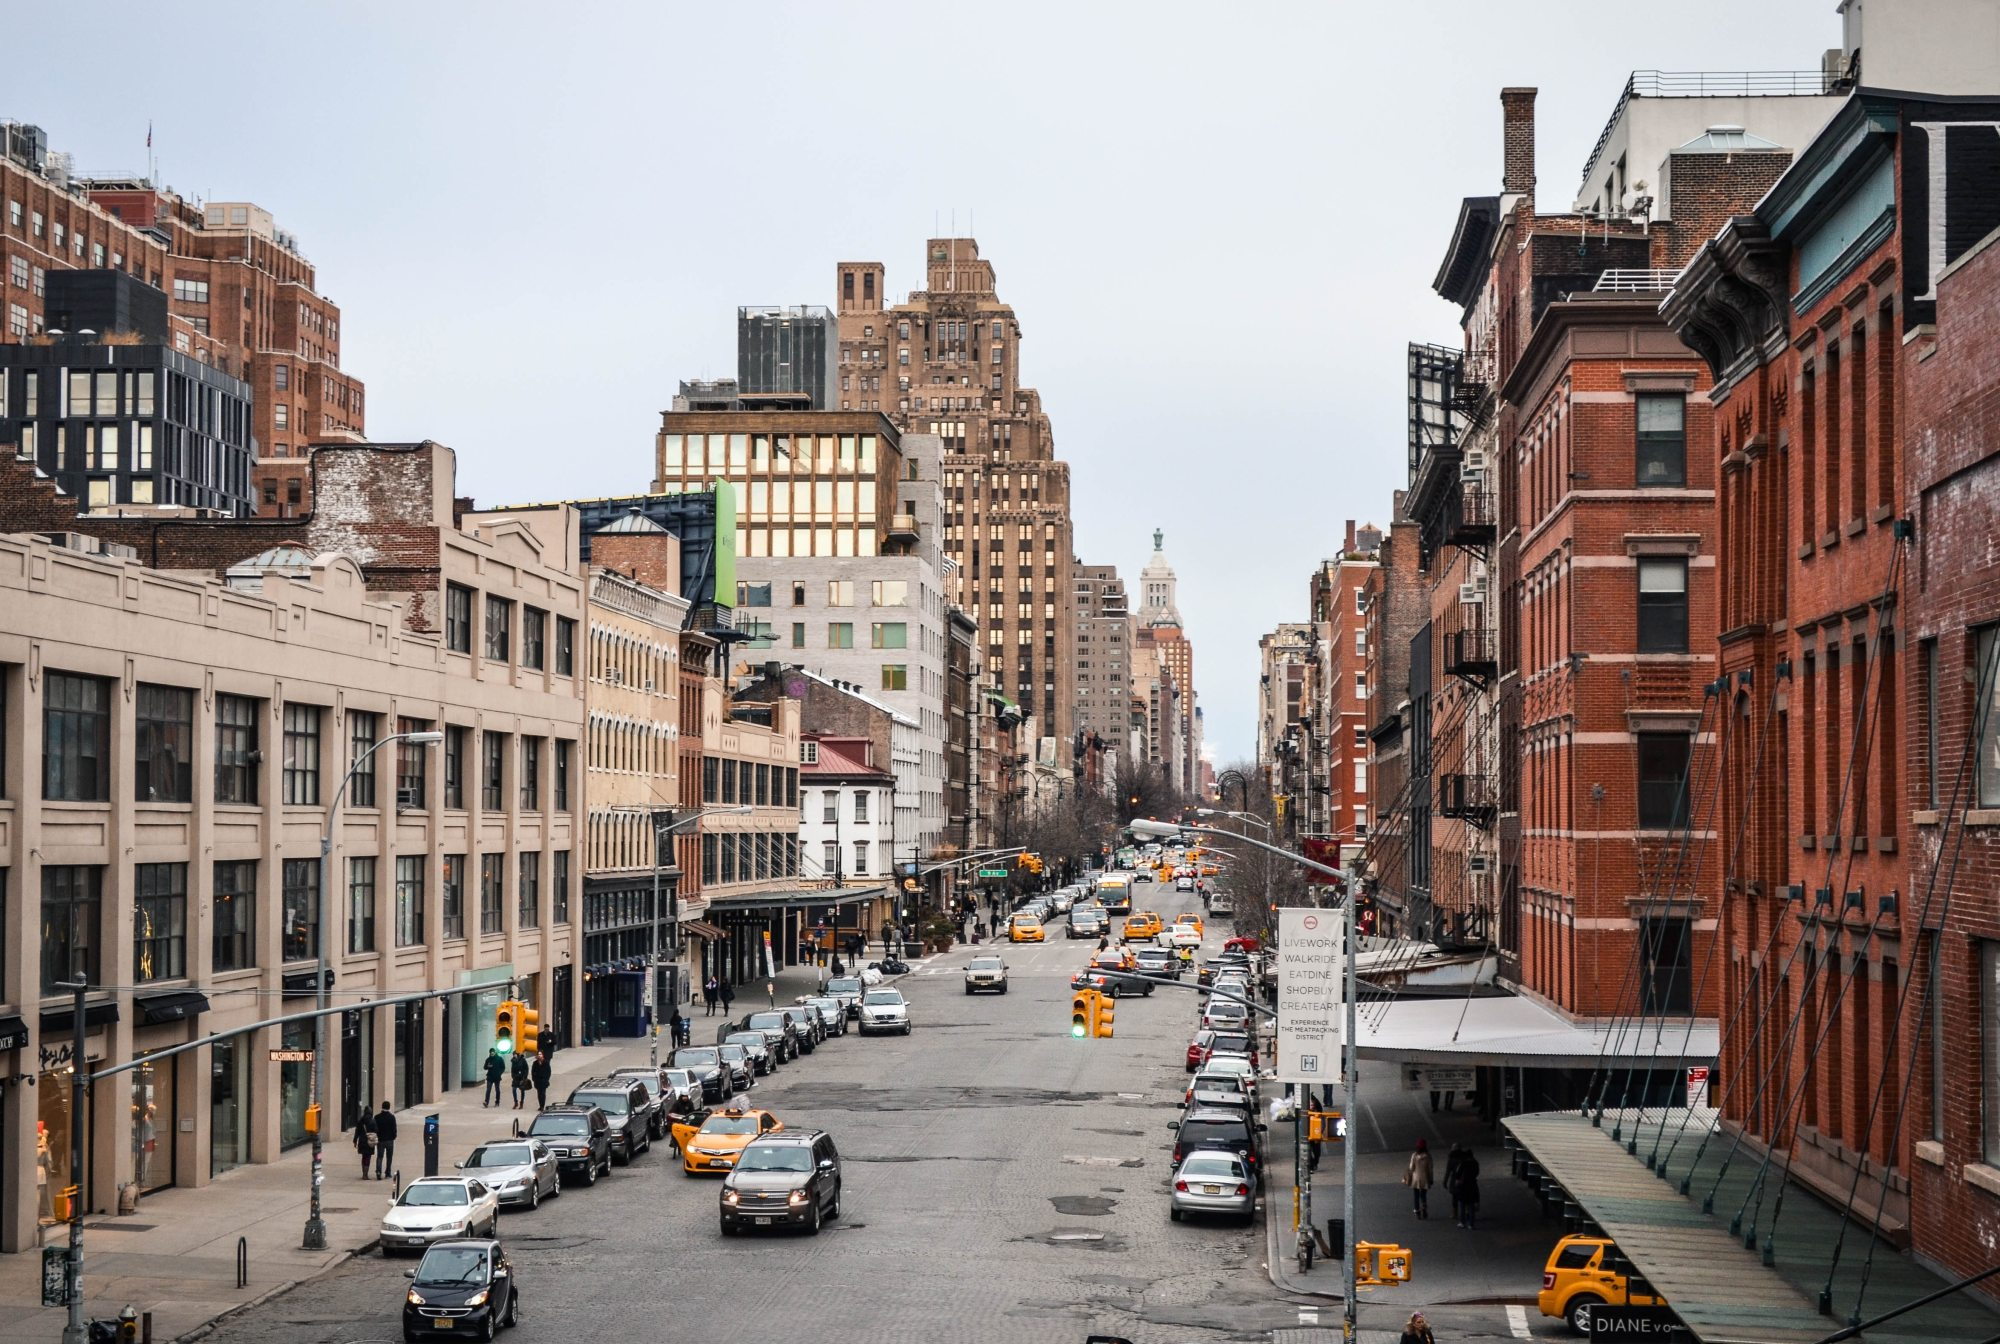 A New York City street